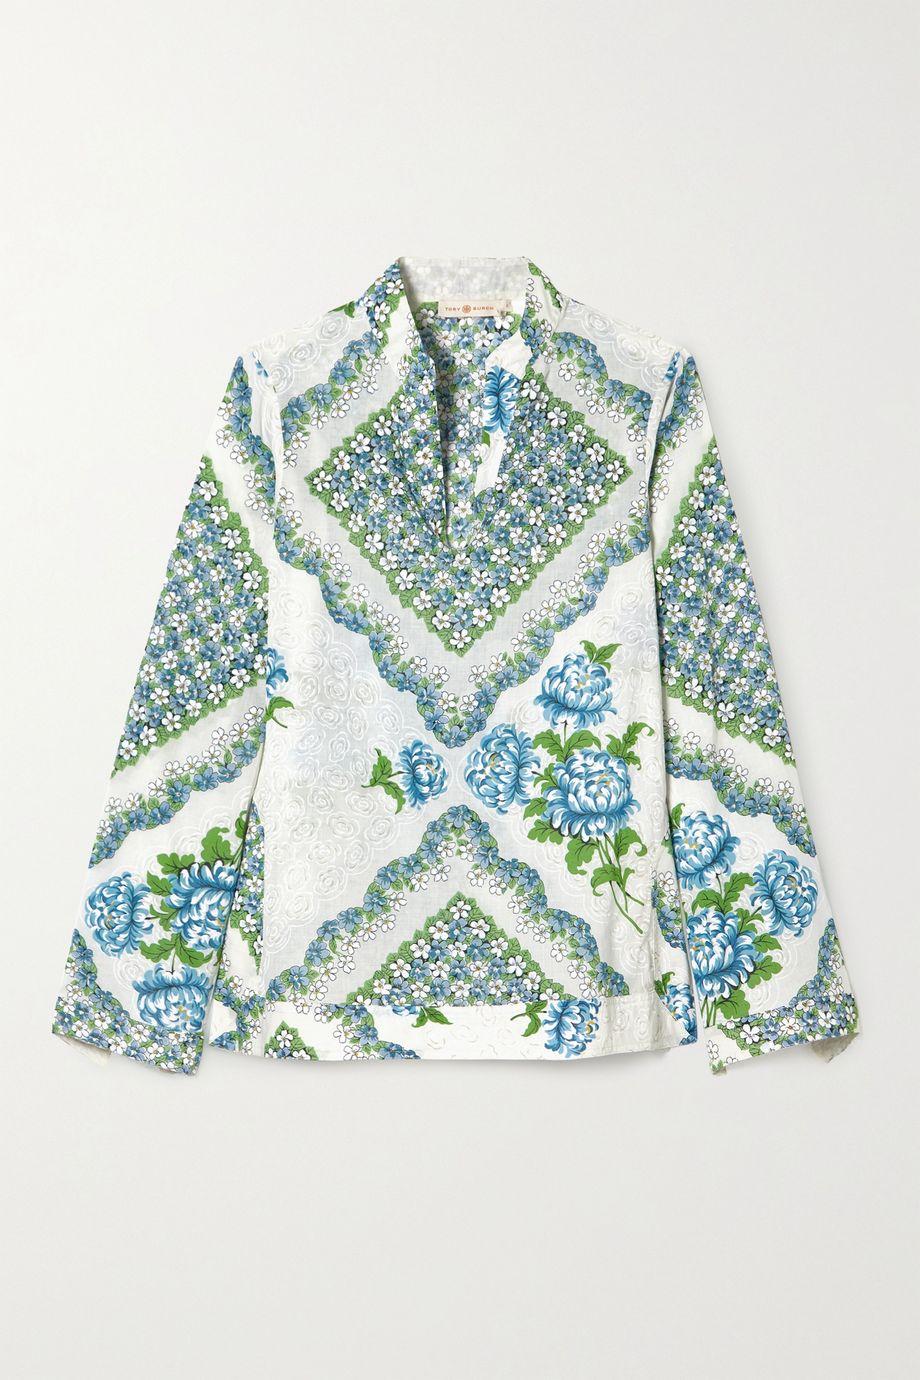 Tory Burch Floral-print cotton-voile blouse